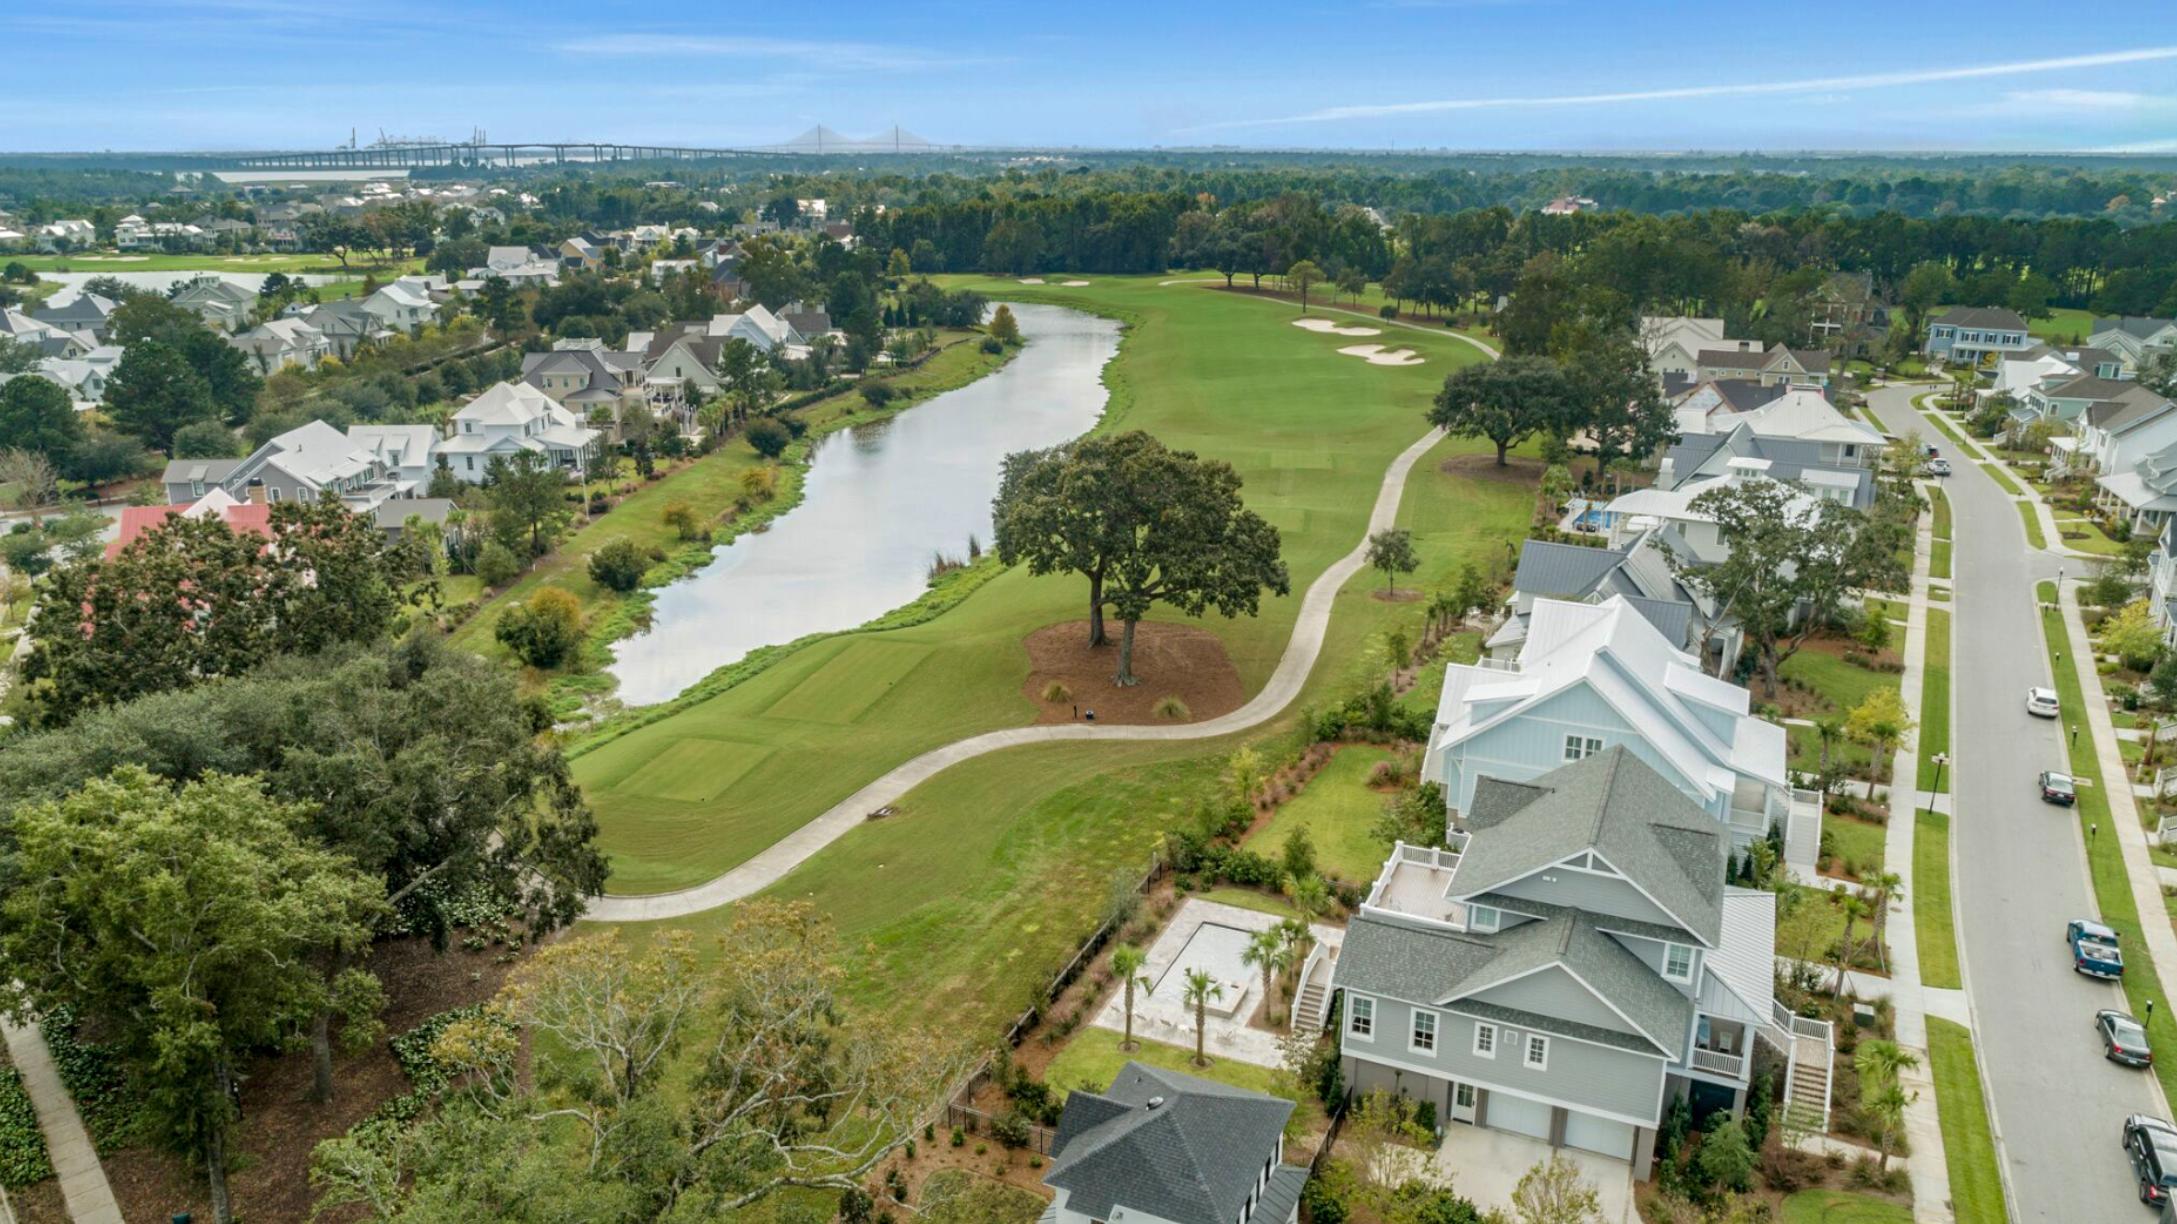 Daniel Island Homes For Sale - 107 Brailsford, Charleston, SC - 3